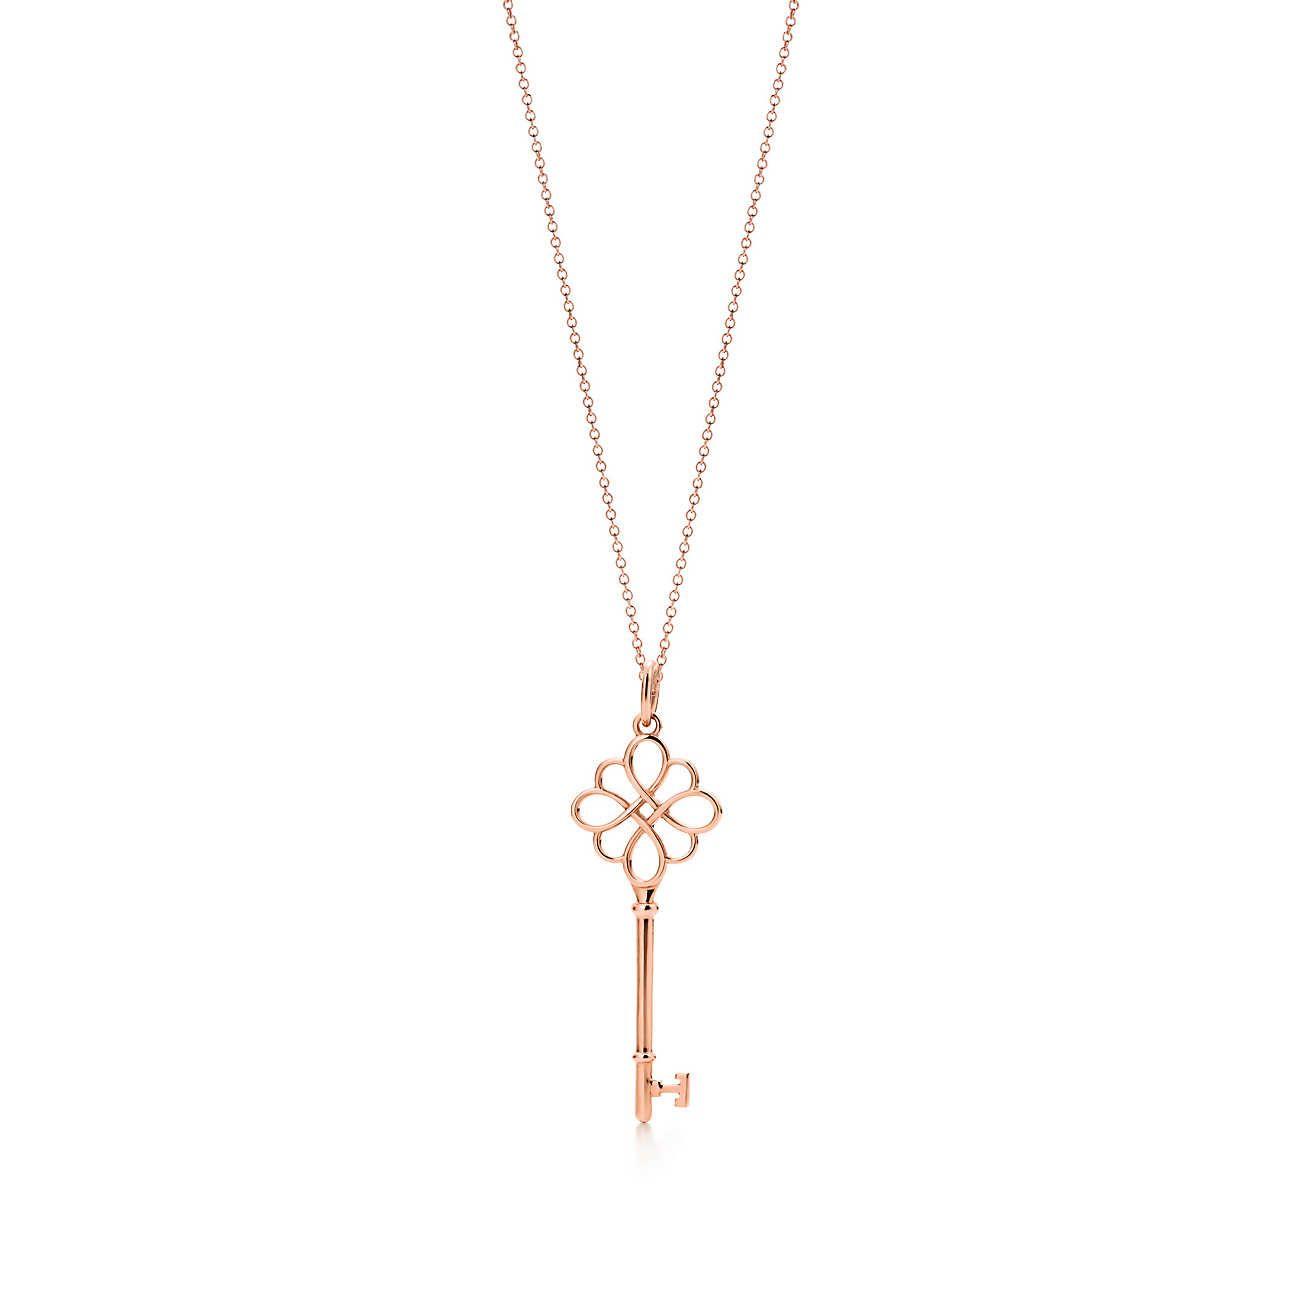 87c5c961f7d2e Tiffany Keys knot key pendant   KEYS. KEY PENDANTS. KEY NECKLACES ...